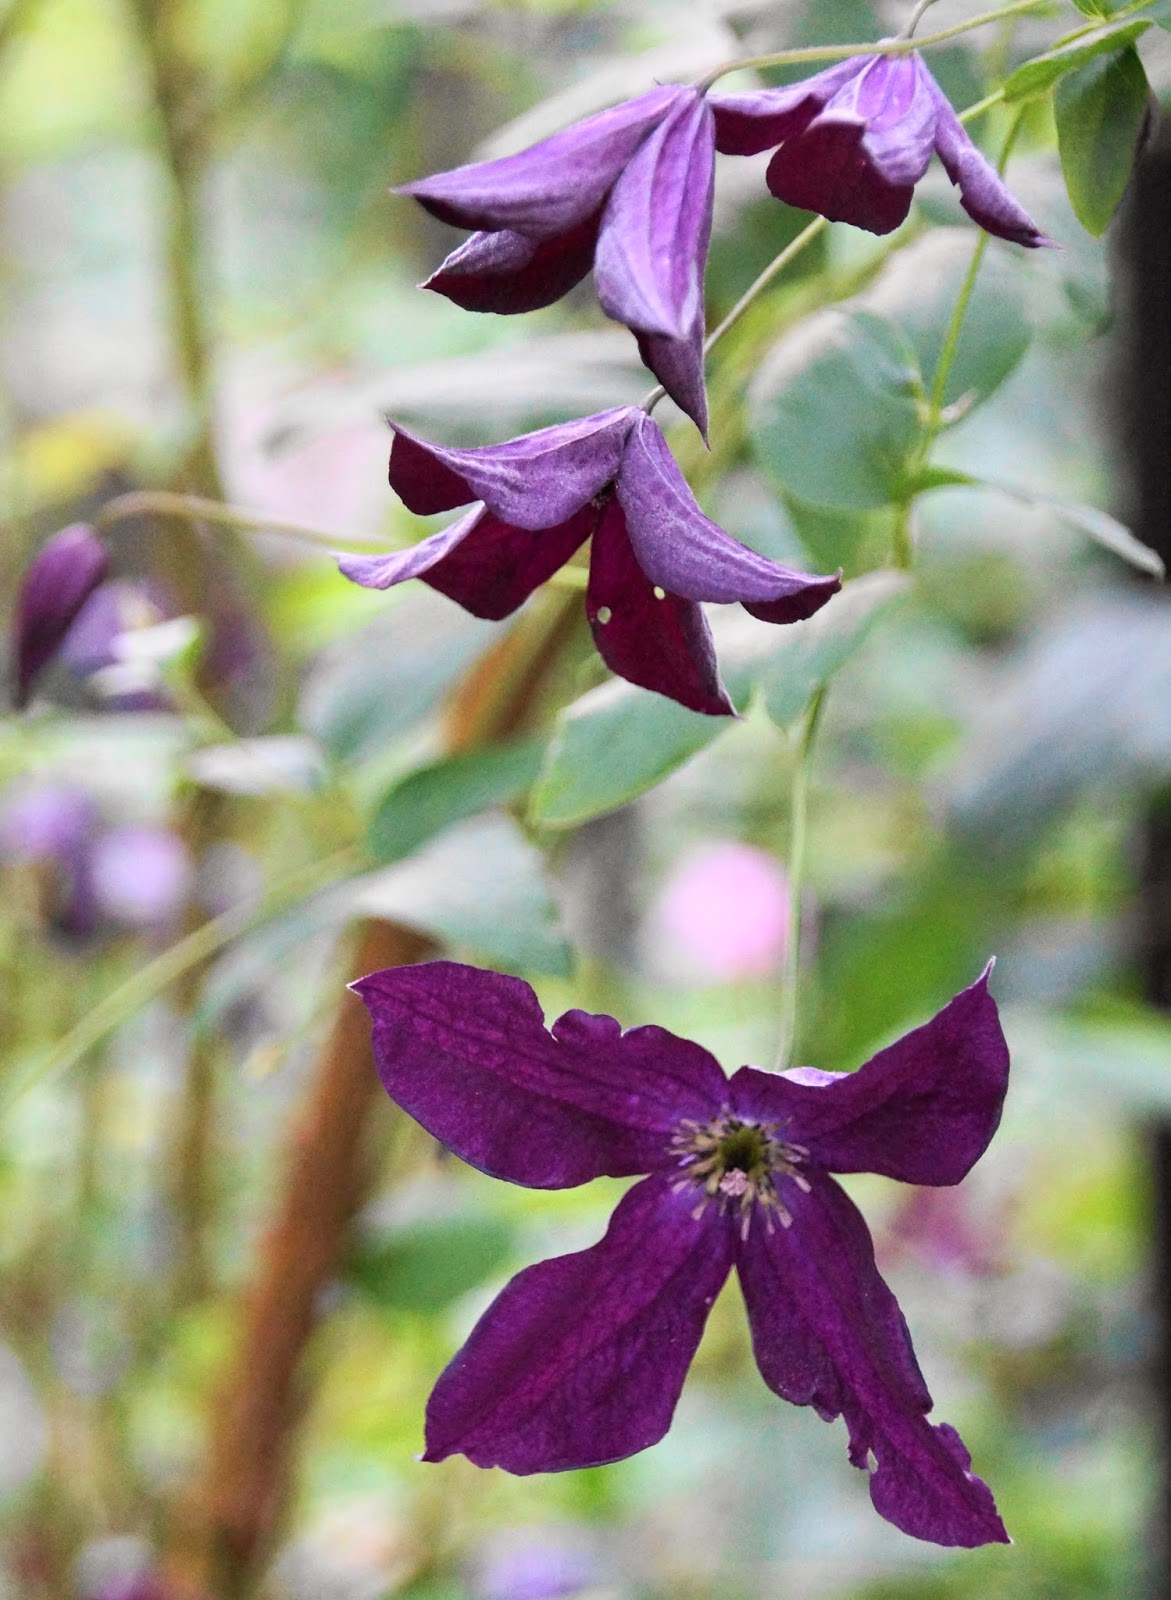 Hage Plants: Juli plante hoste og nyte late dager i hagen. Nyttehage ...